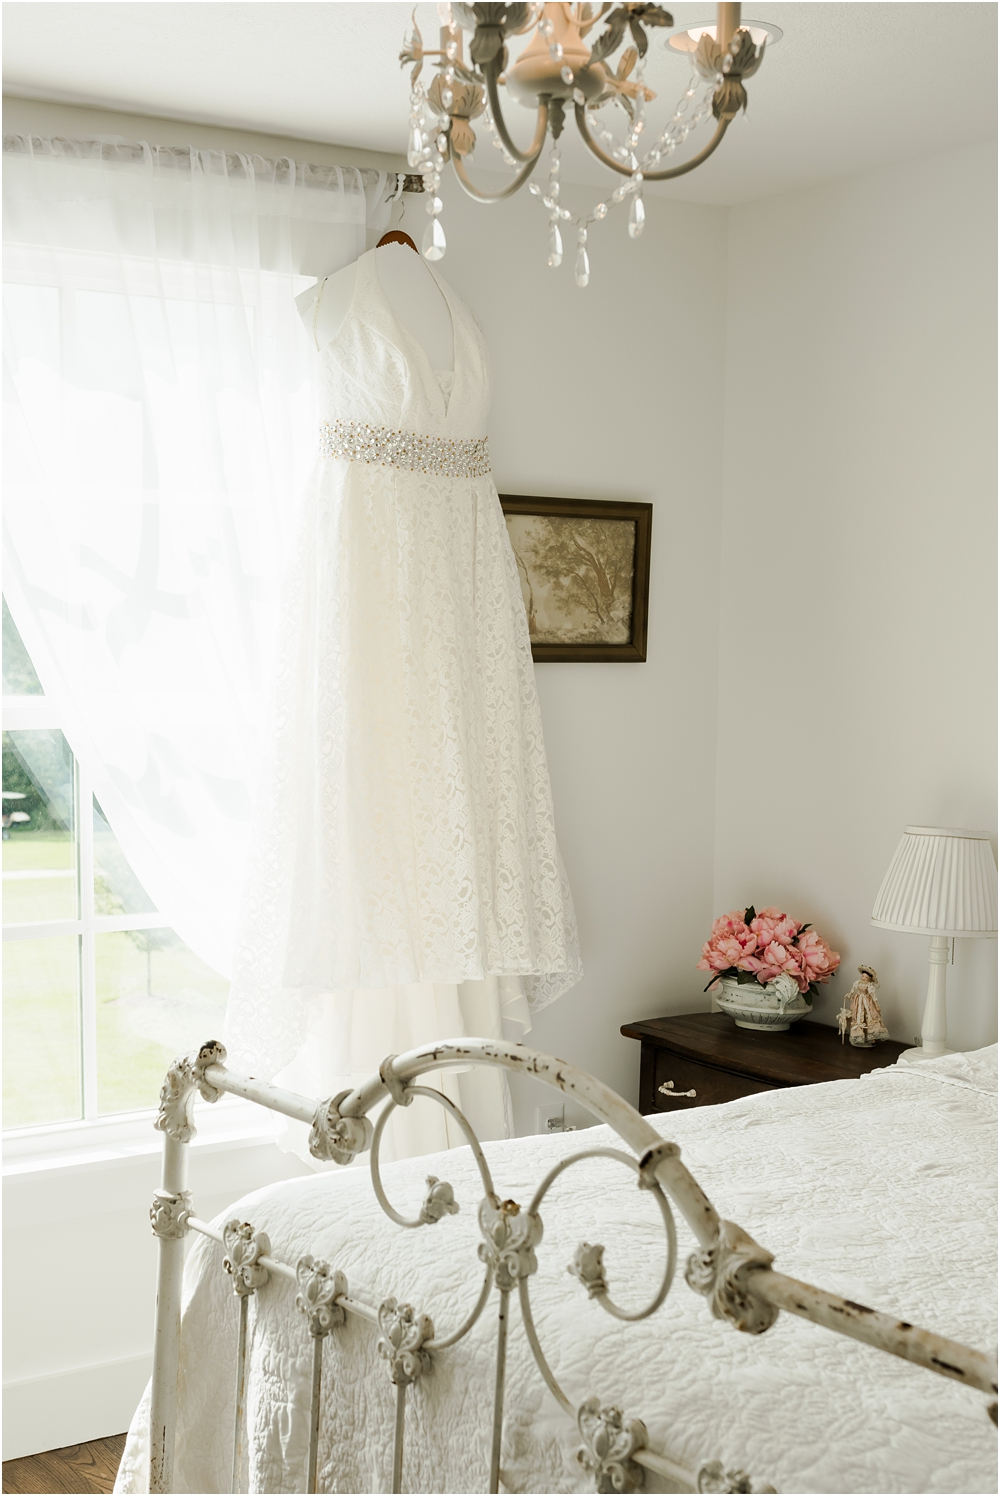 mosley-wedding-kiersten-stevenson-photography-30a-panama-city-beach-dothan-tallahassee-(52-of-472).JPG